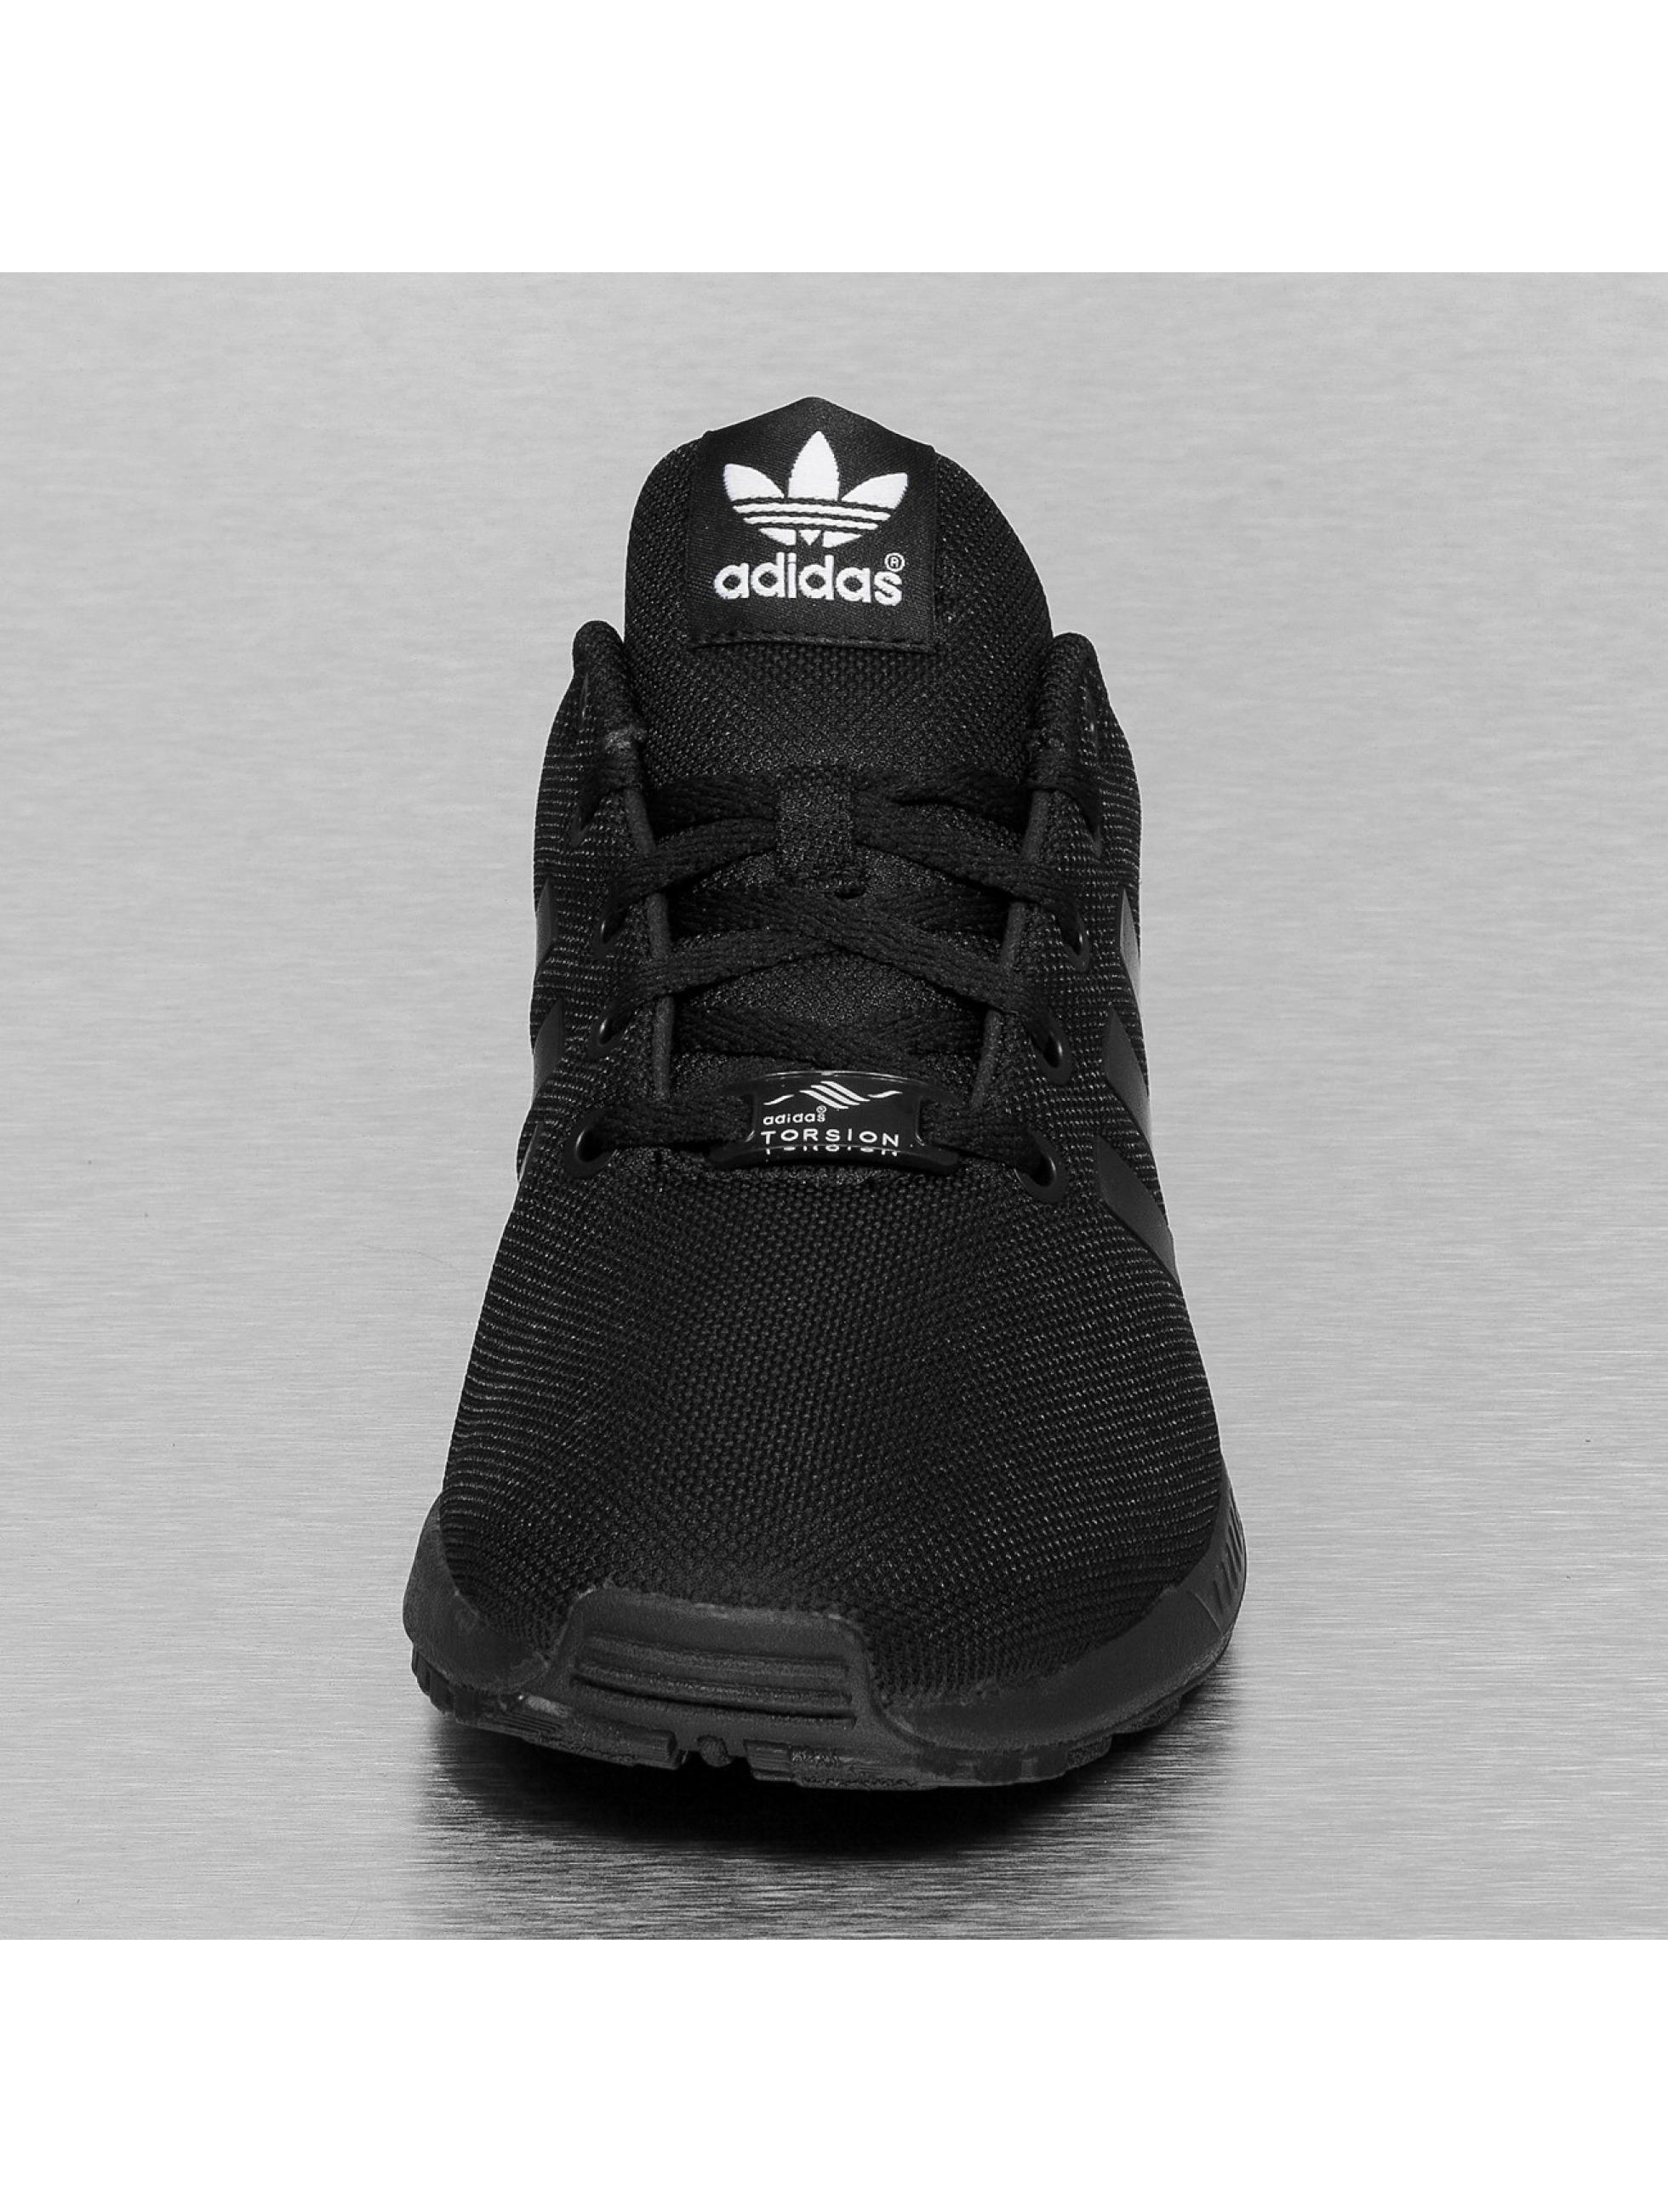 adidas damen sneaker zx flux in schwarz 187015. Black Bedroom Furniture Sets. Home Design Ideas